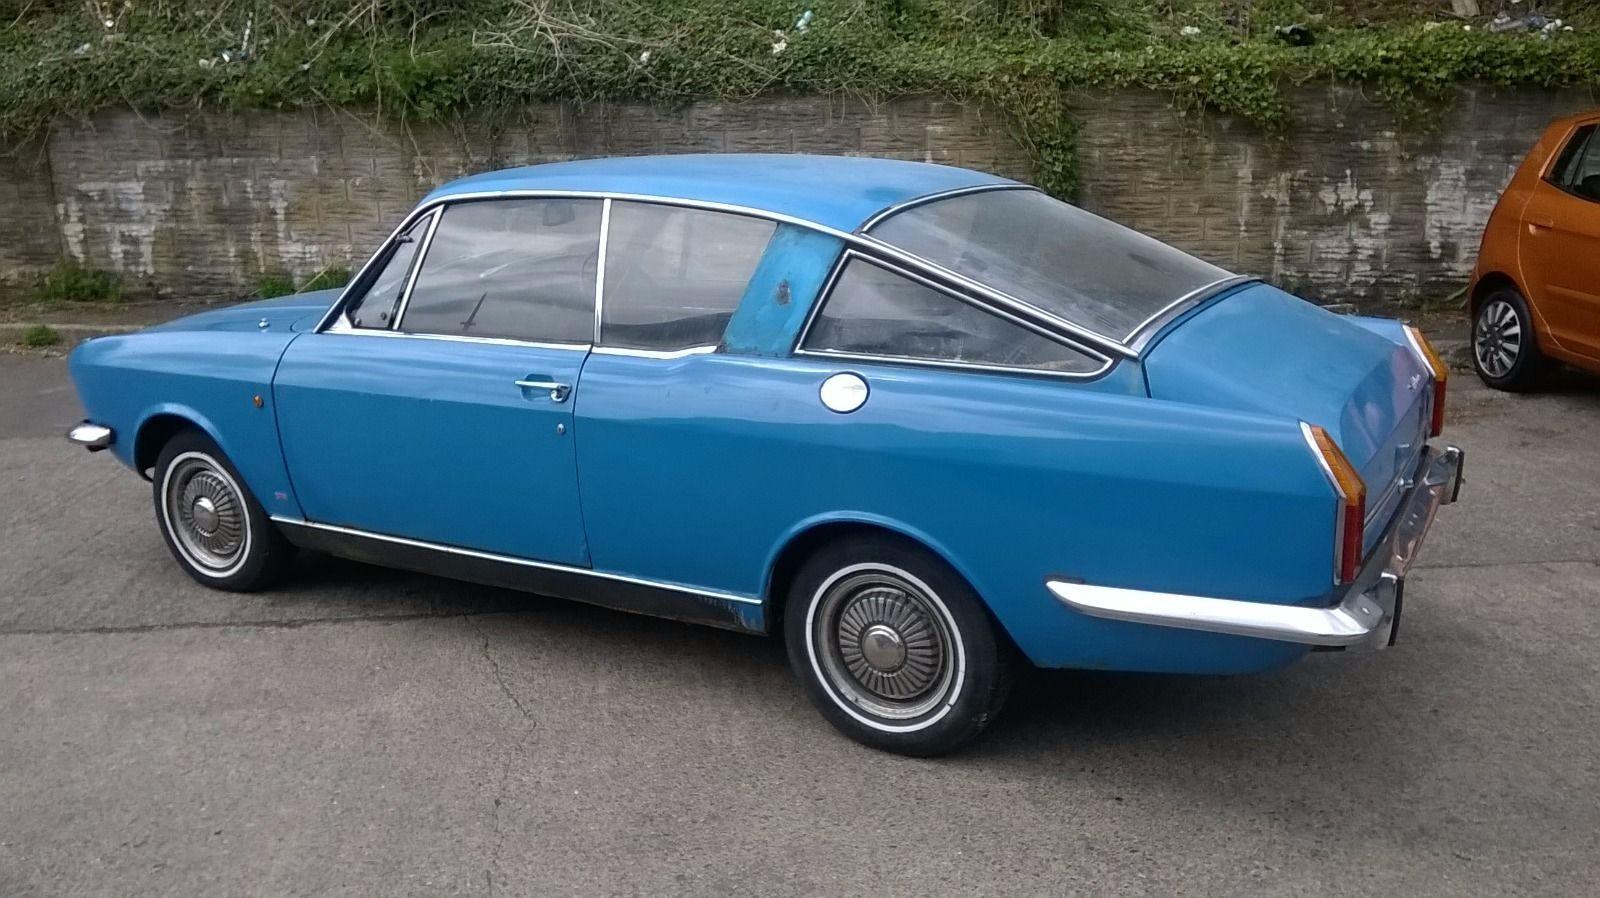 Classic car sunbeam | Cars, Diecast and Vehicle